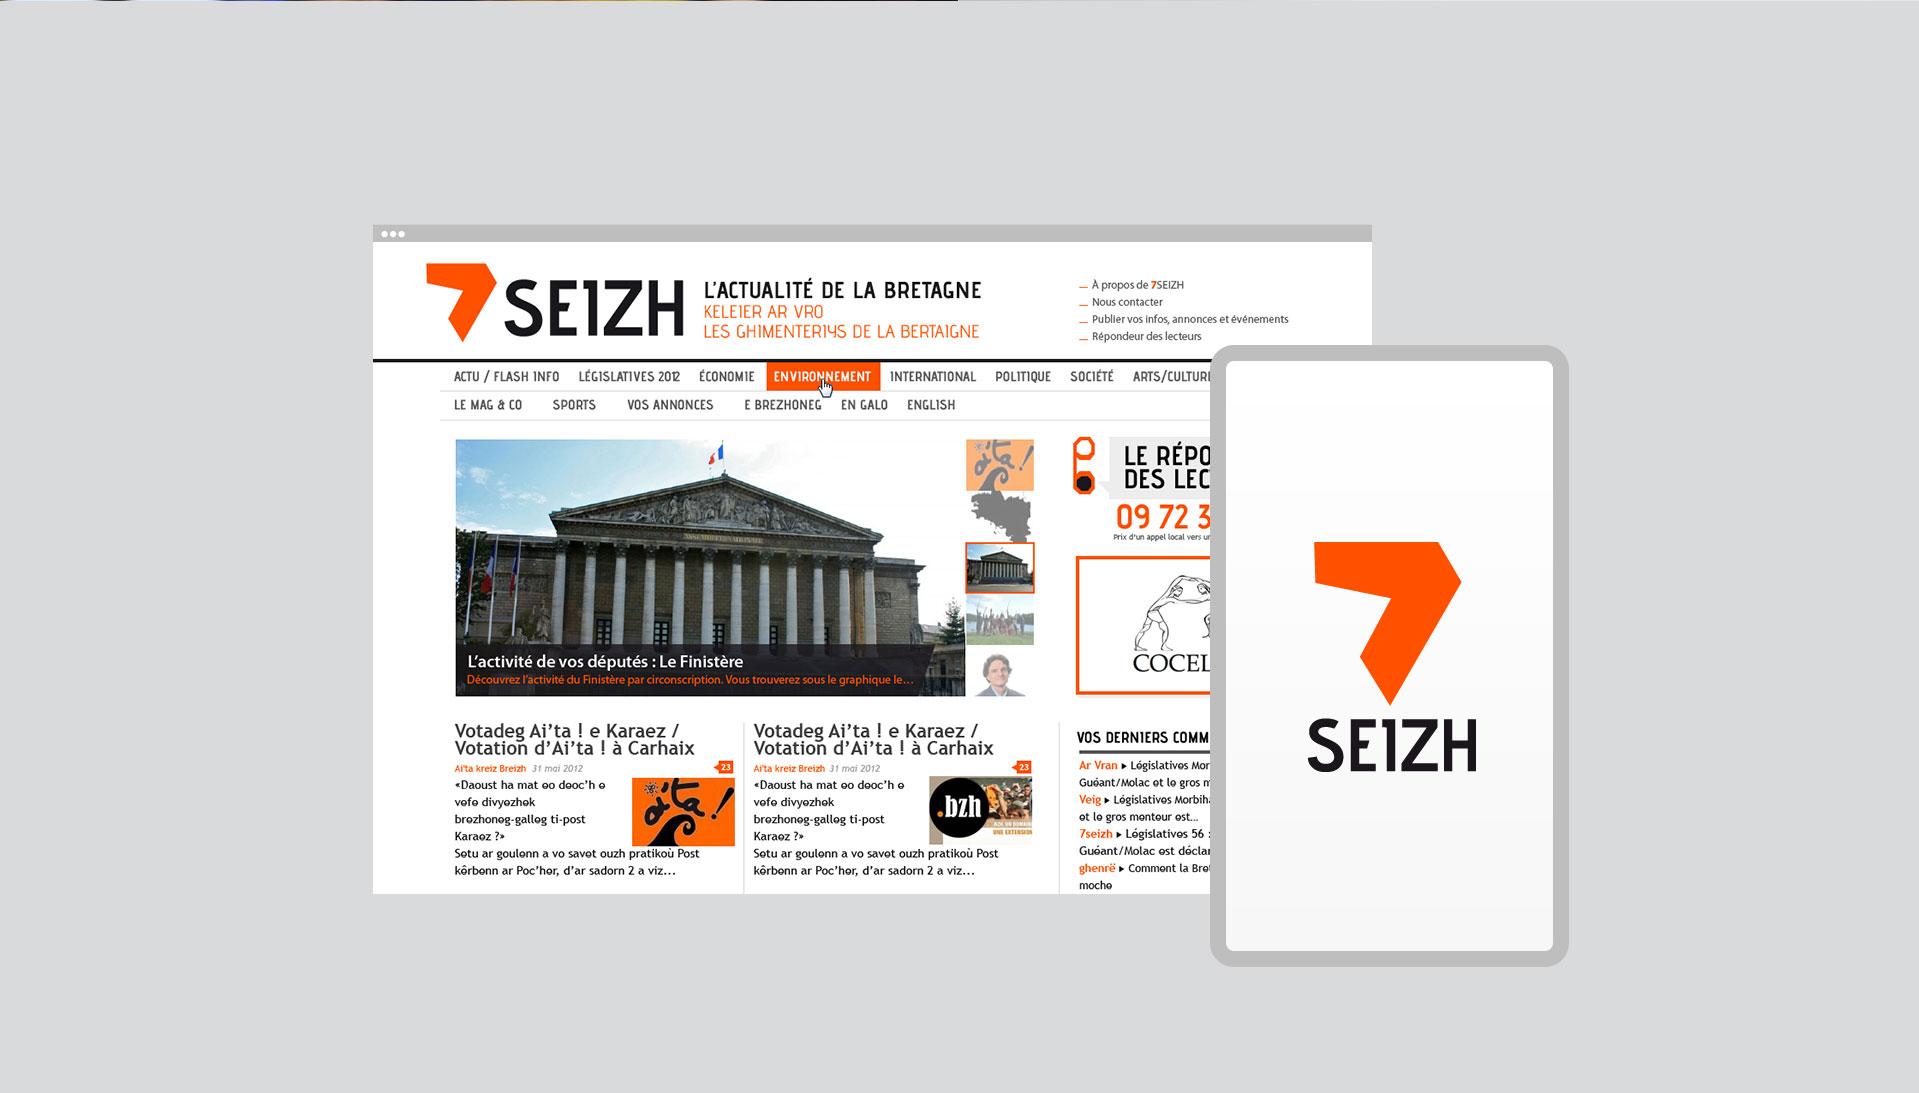 7seizh-scr1b